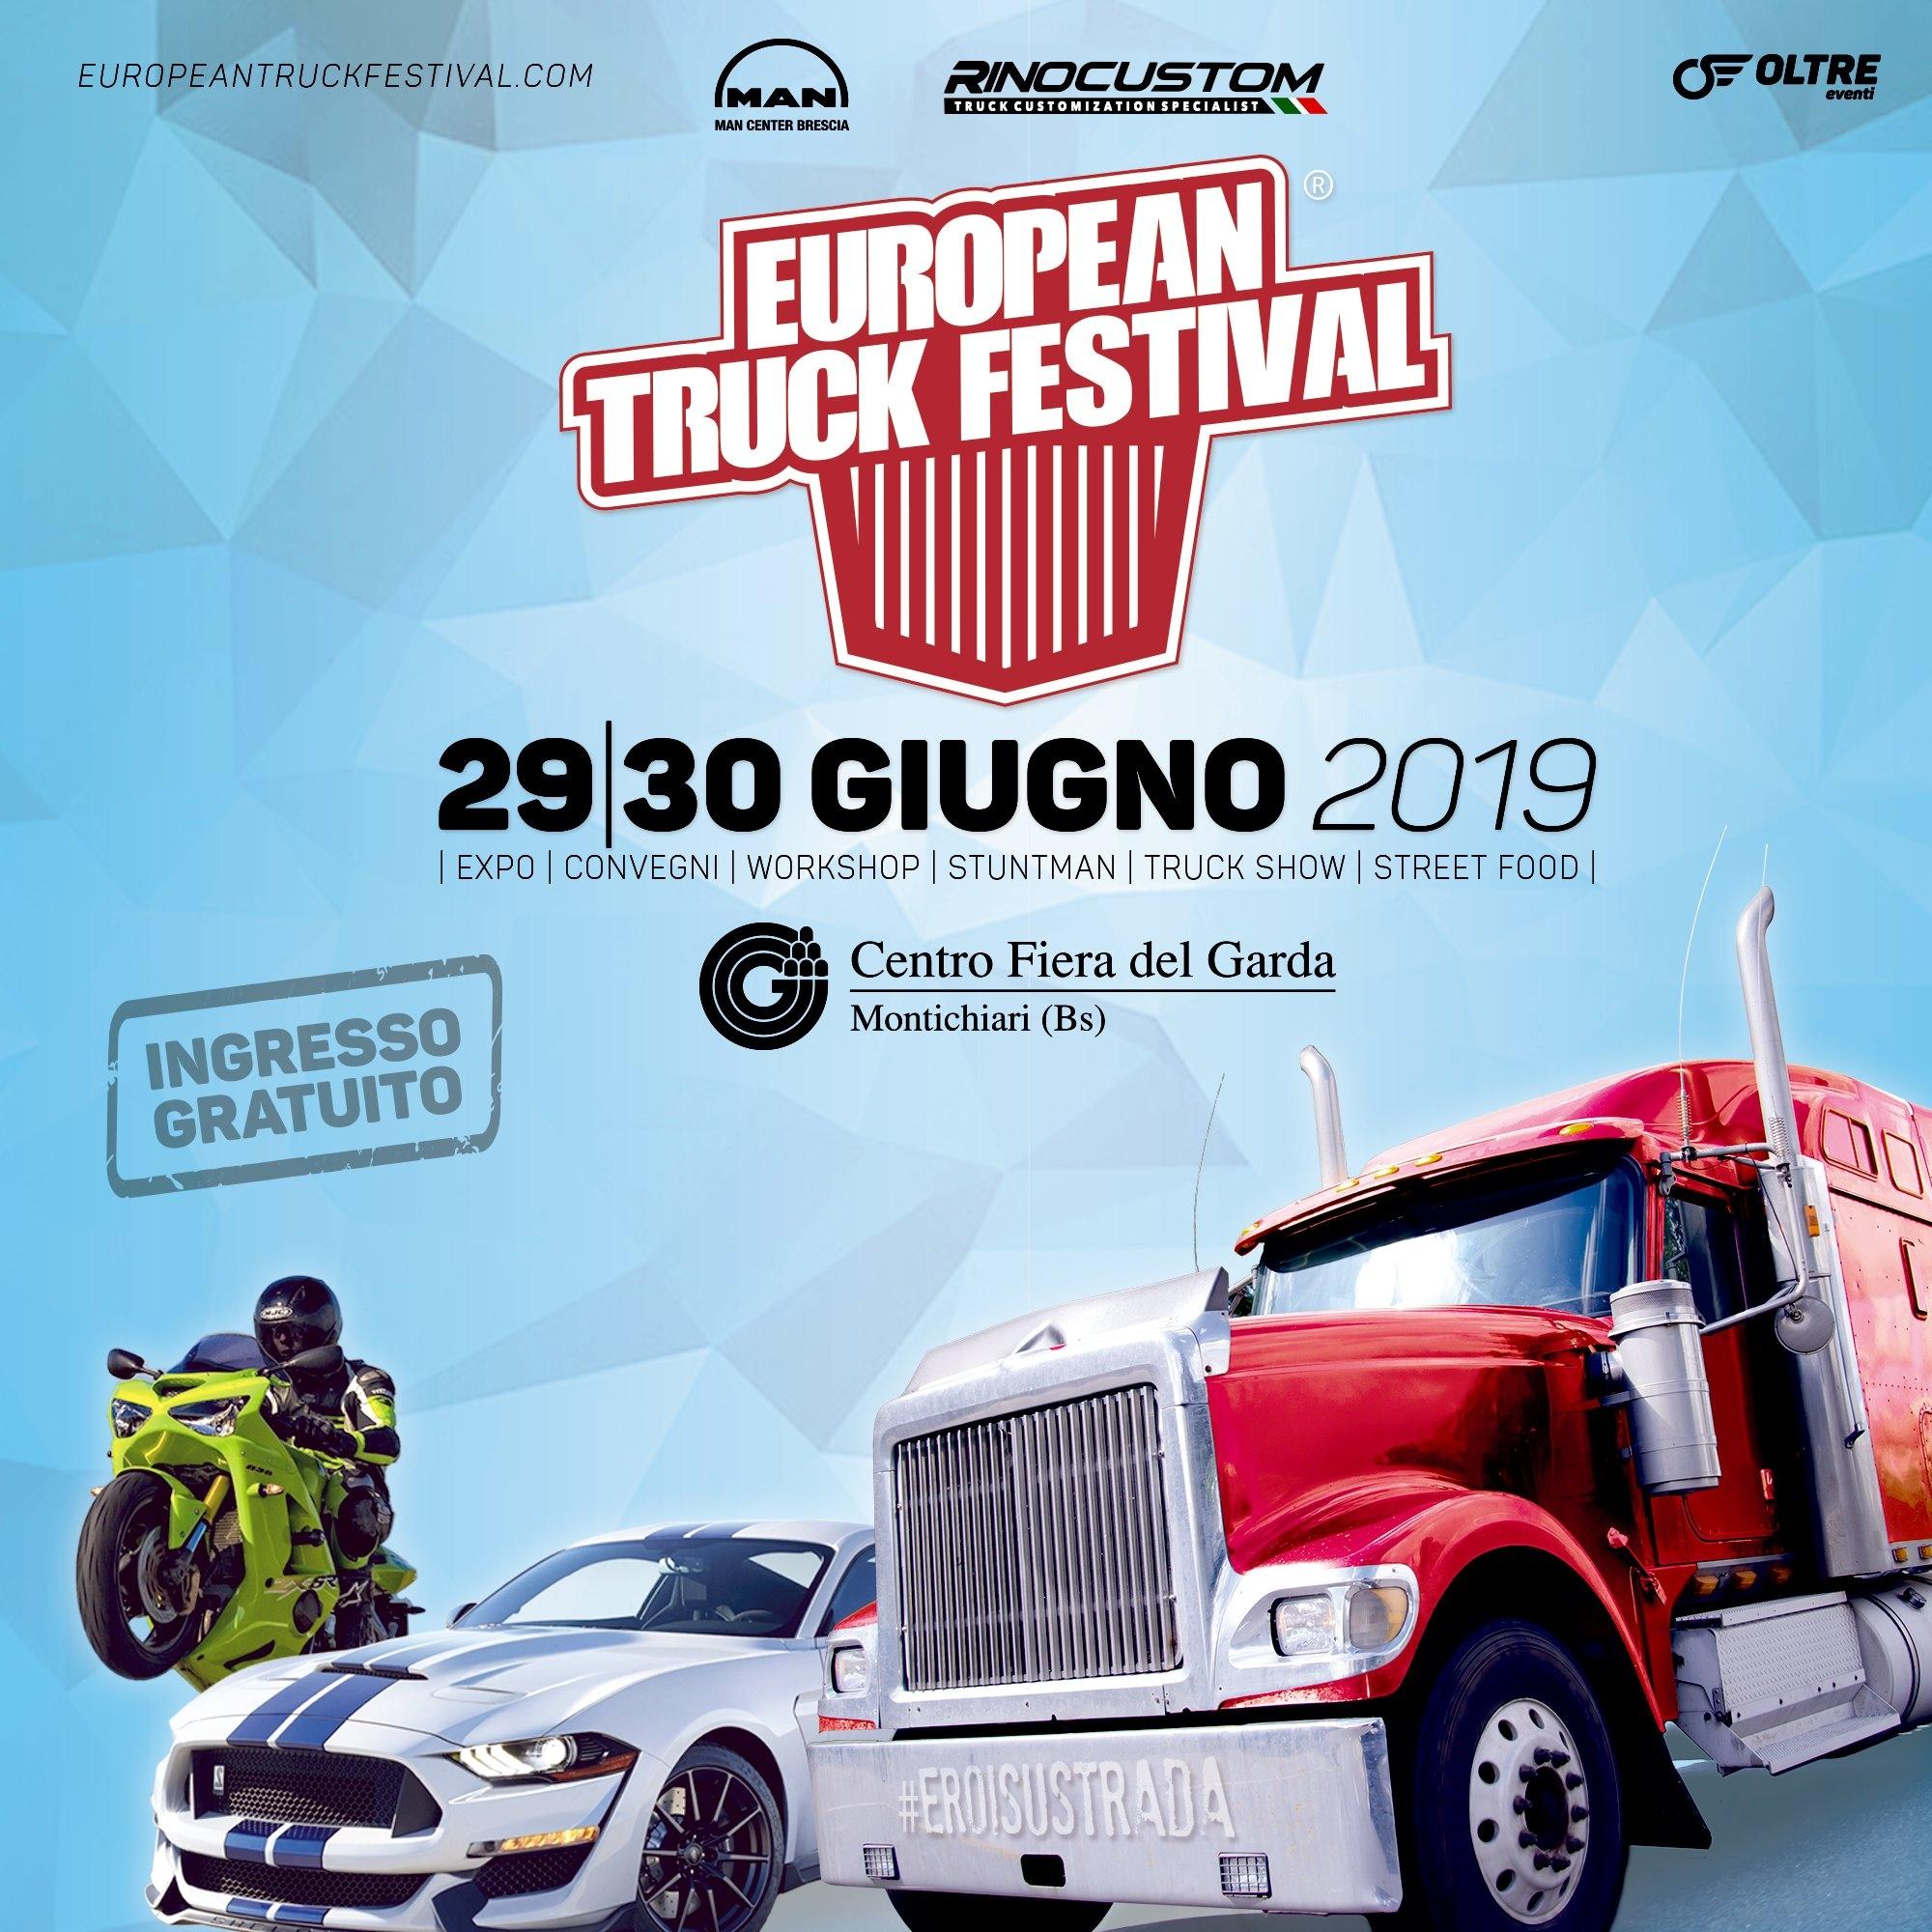 European Truck Festival 2019